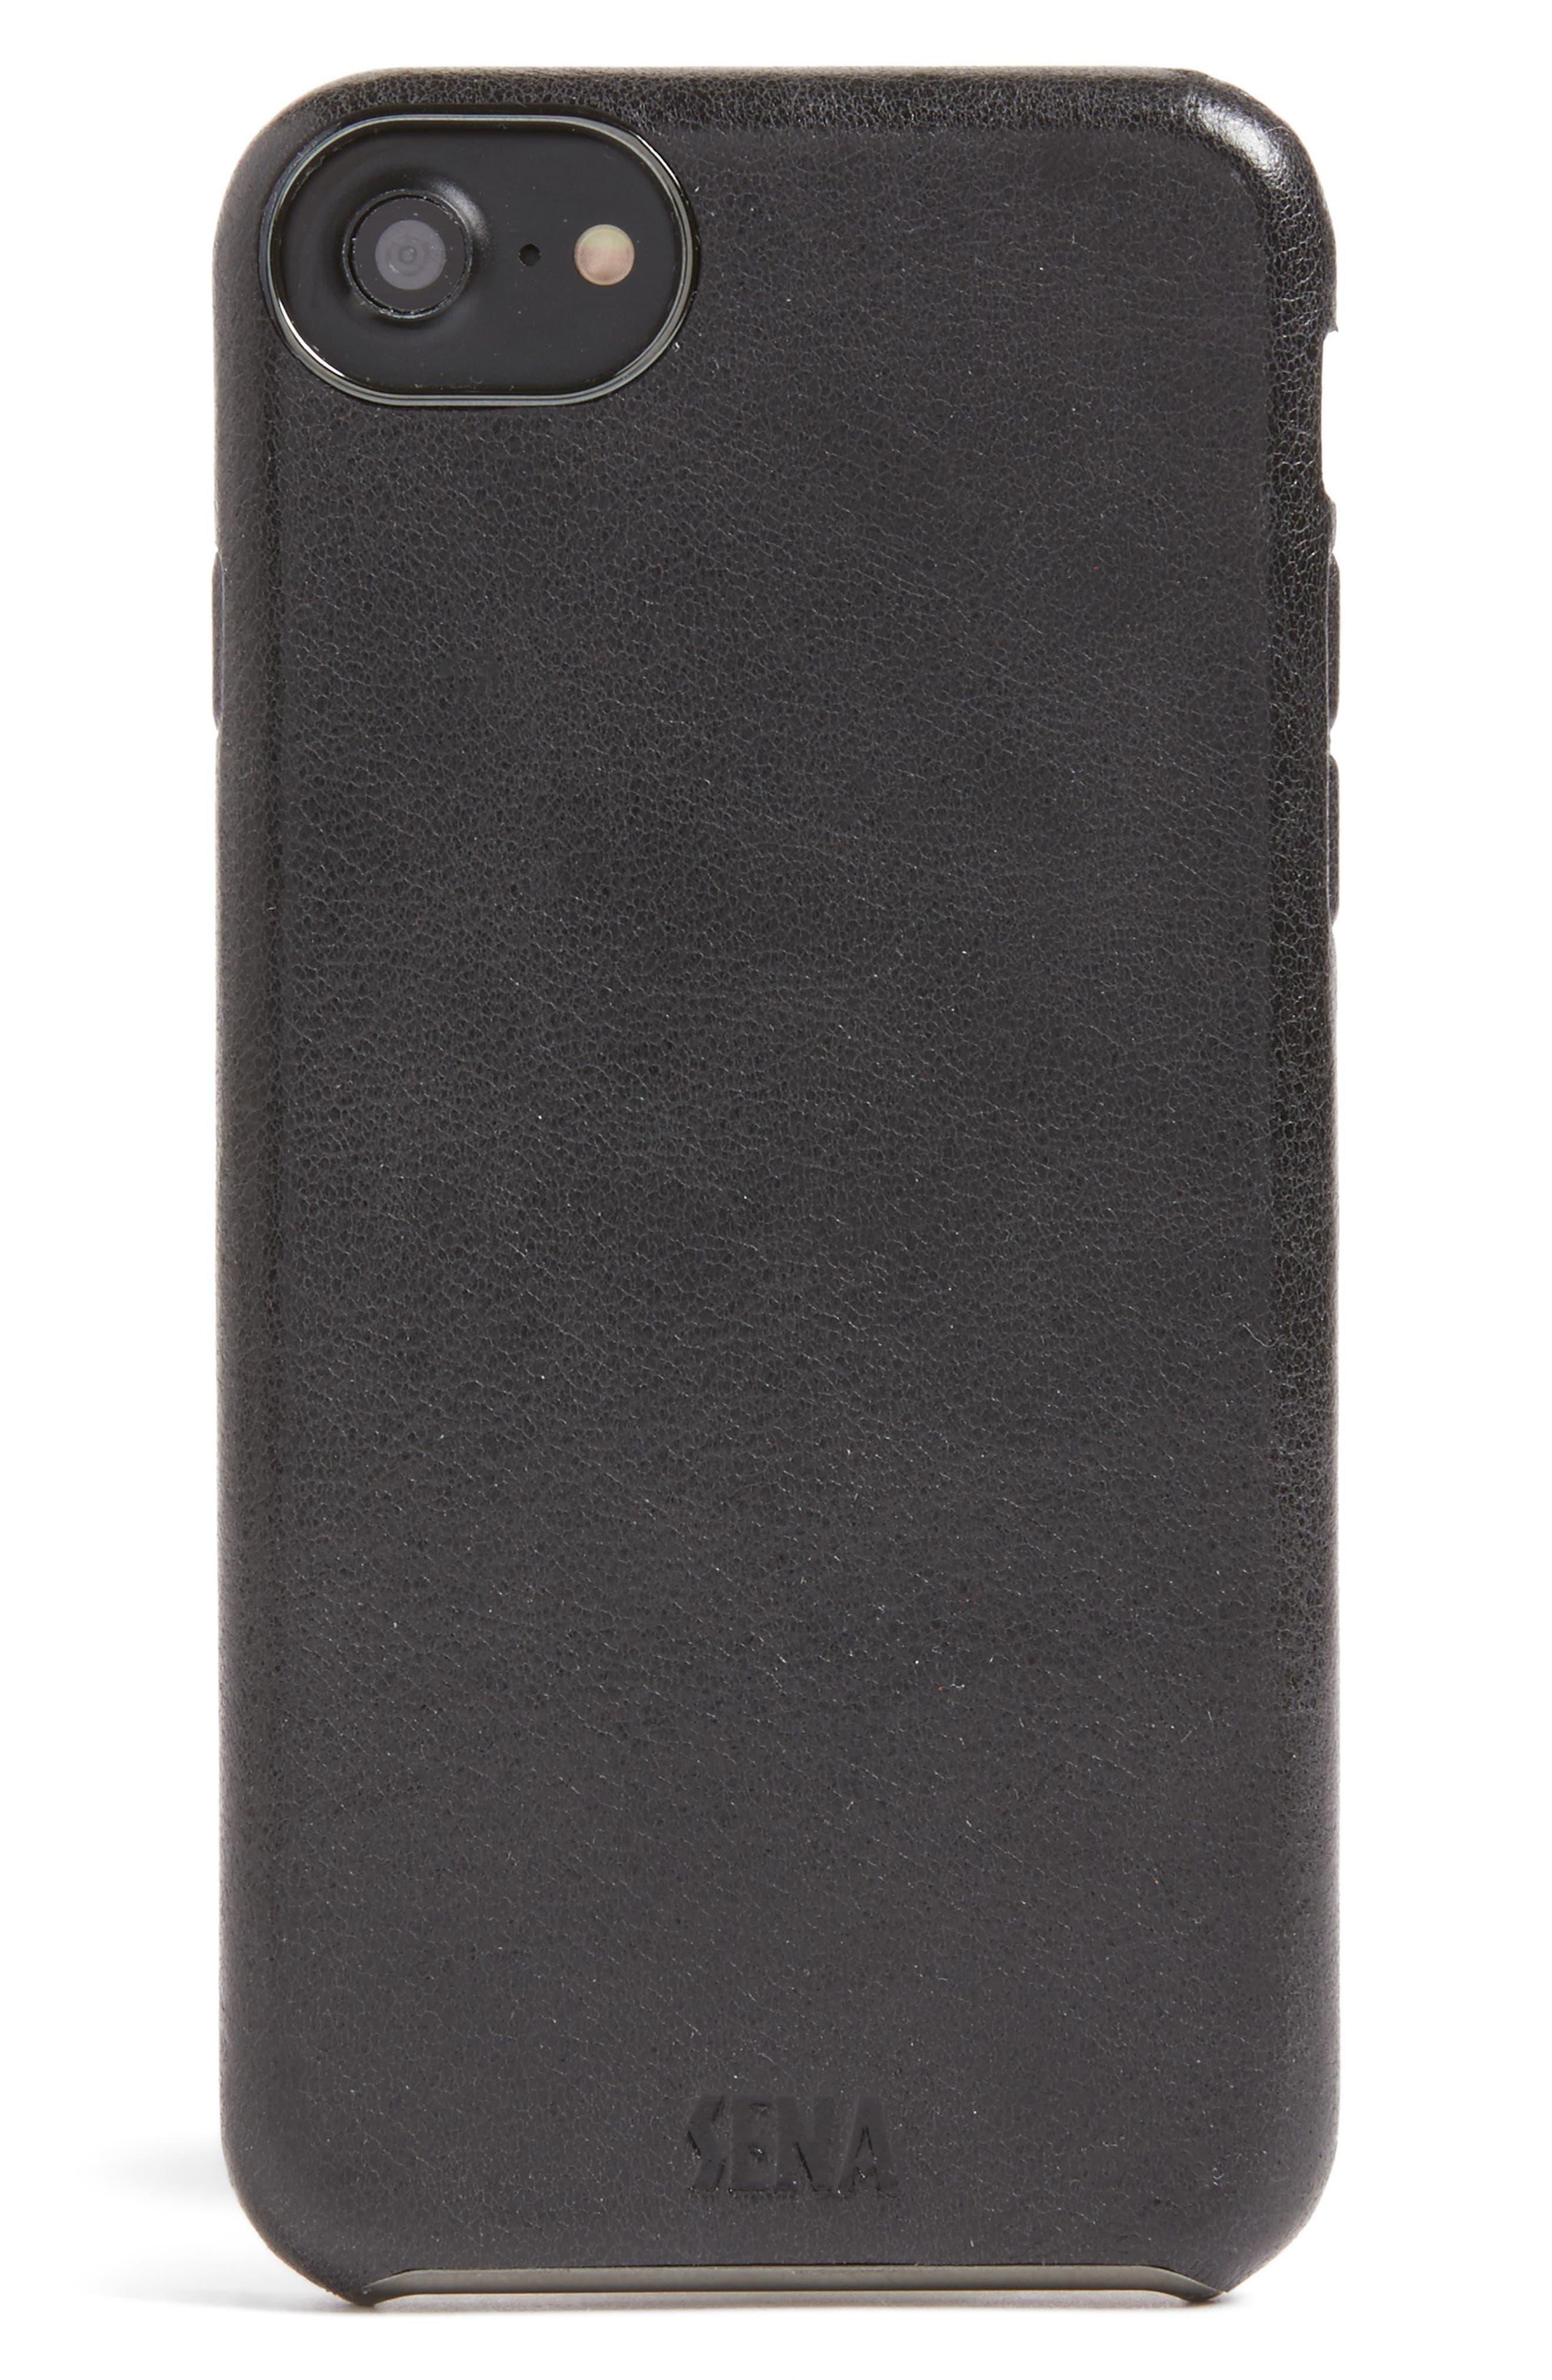 Sena Ultra Thin iPhone 7/8 Snap-On Case